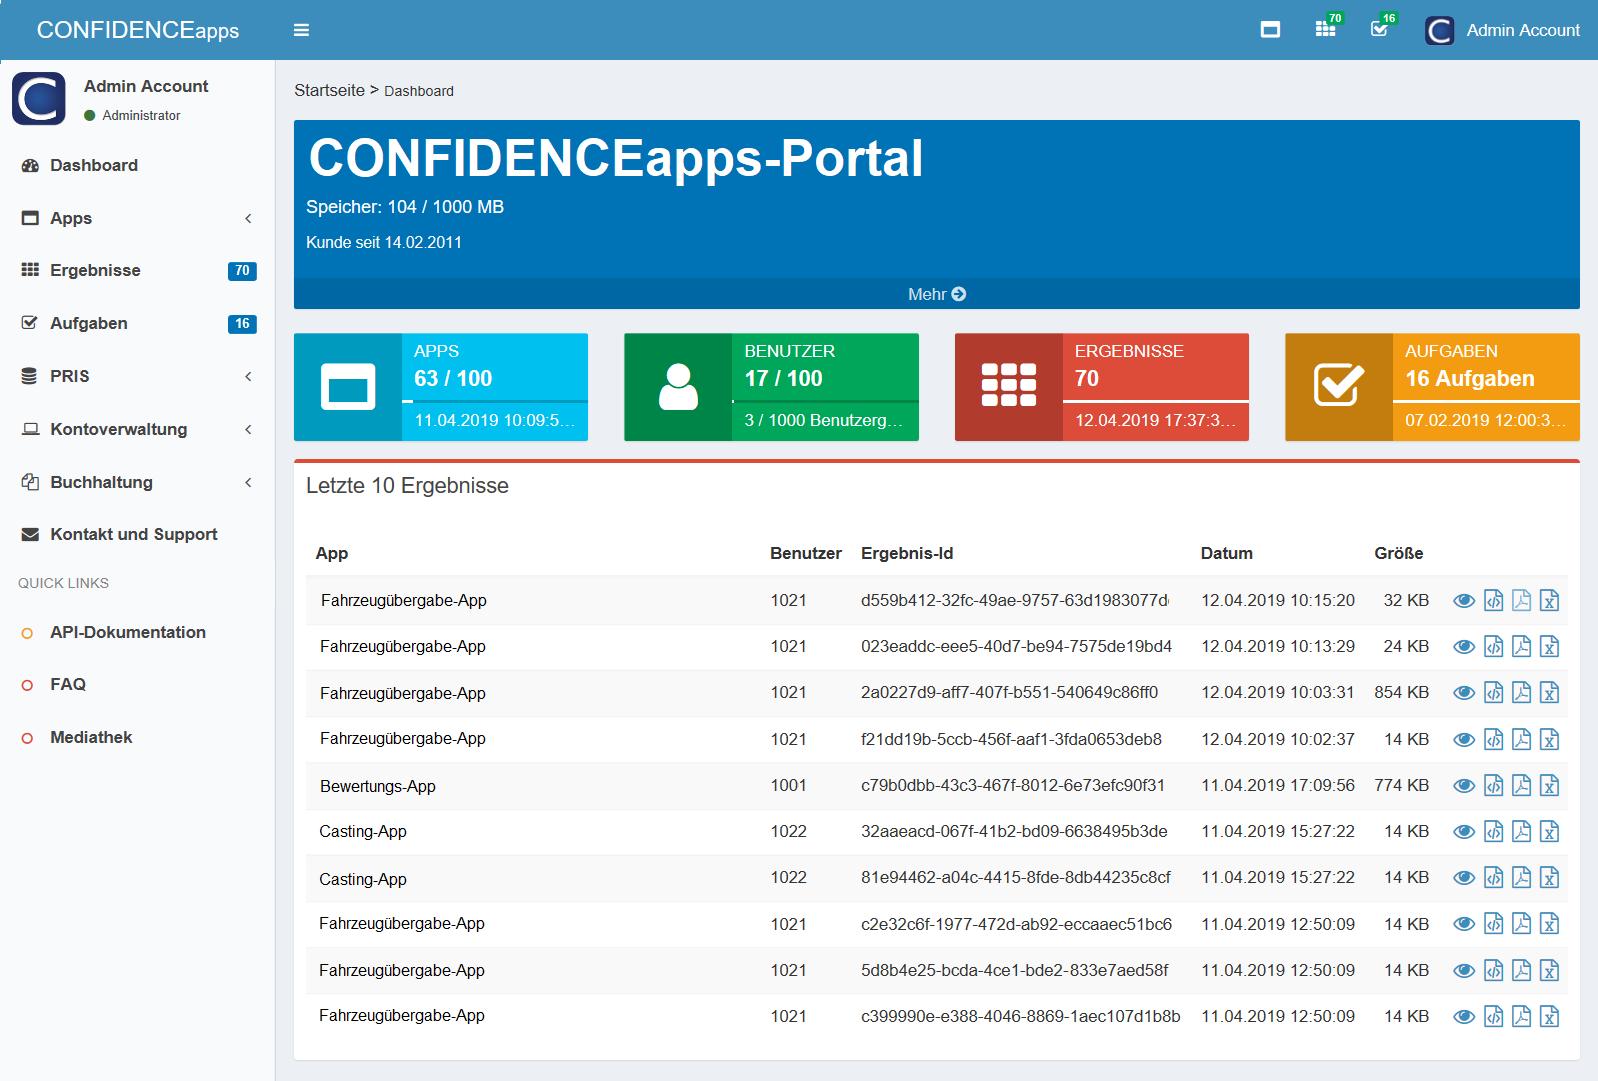 Verwalten mit CONFIDENCEapps-Portal